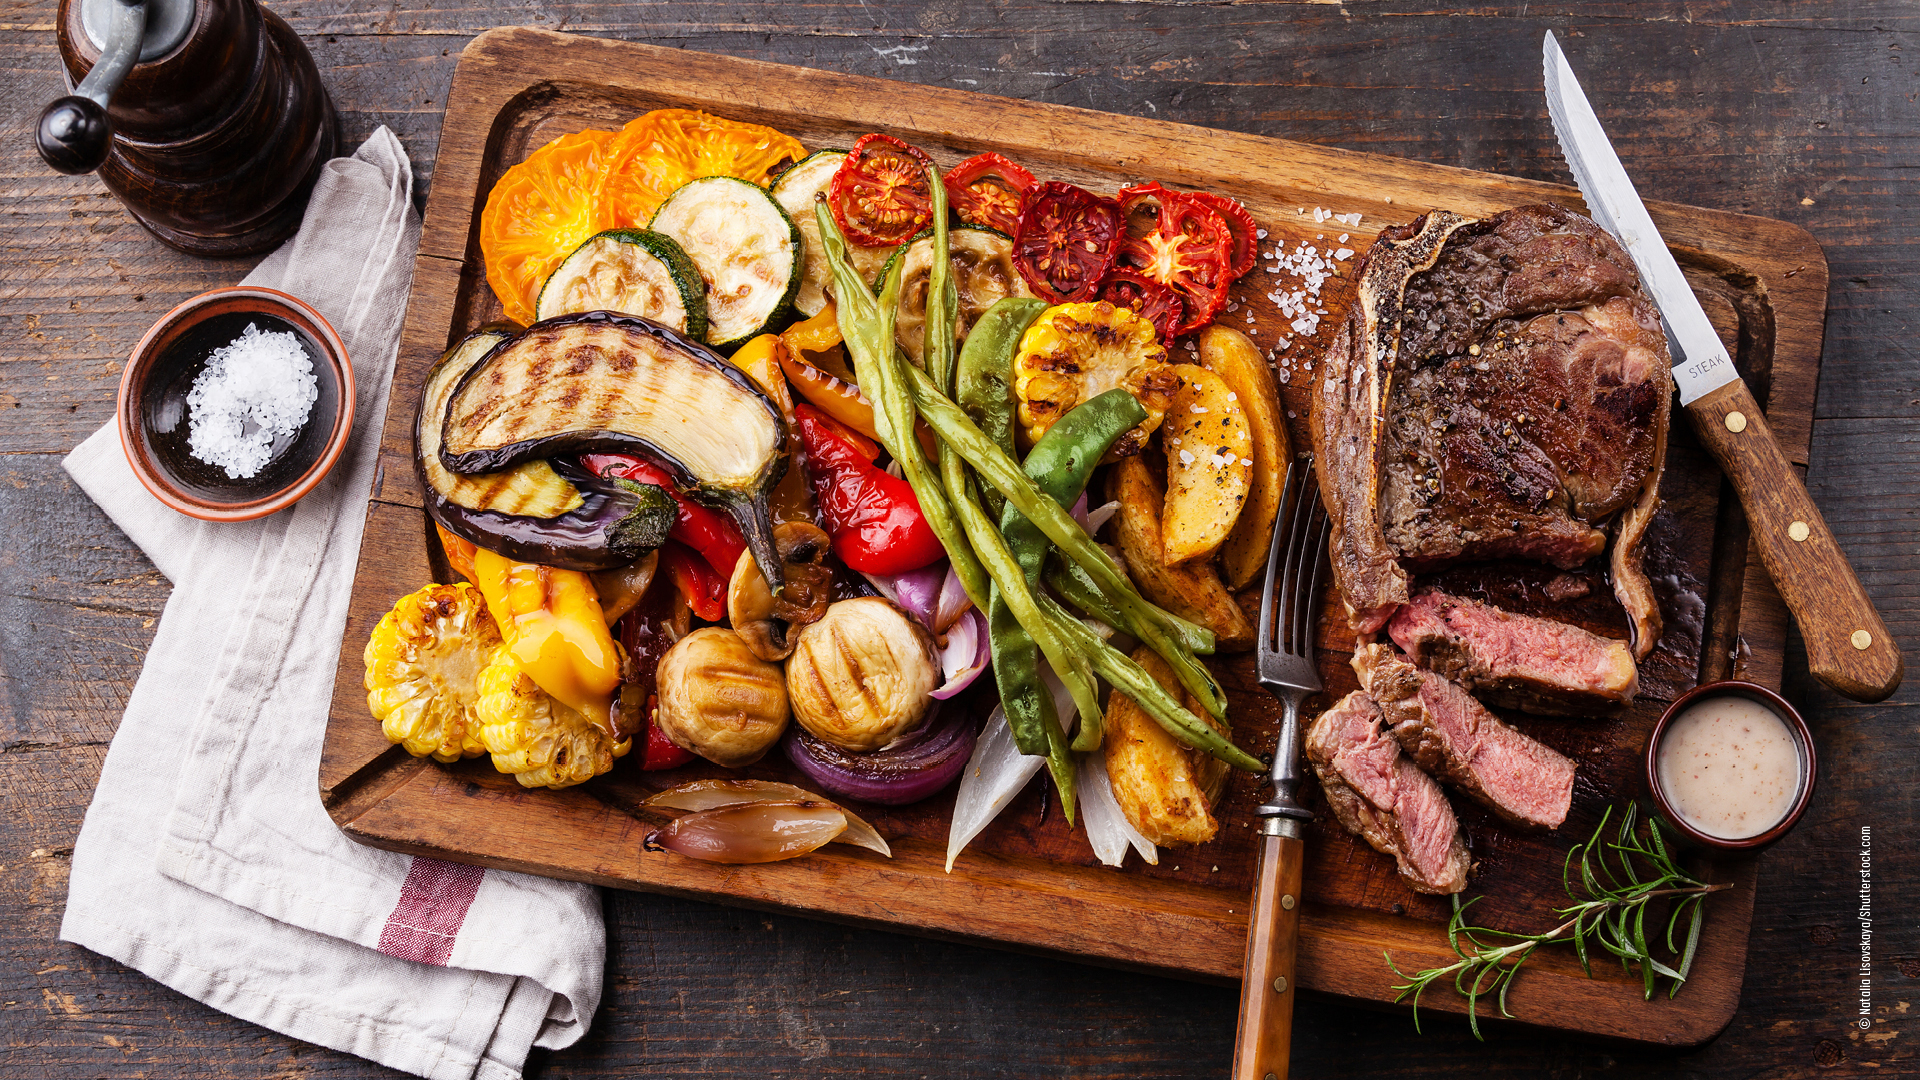 Gemüse_Foodstyling_Querkochen